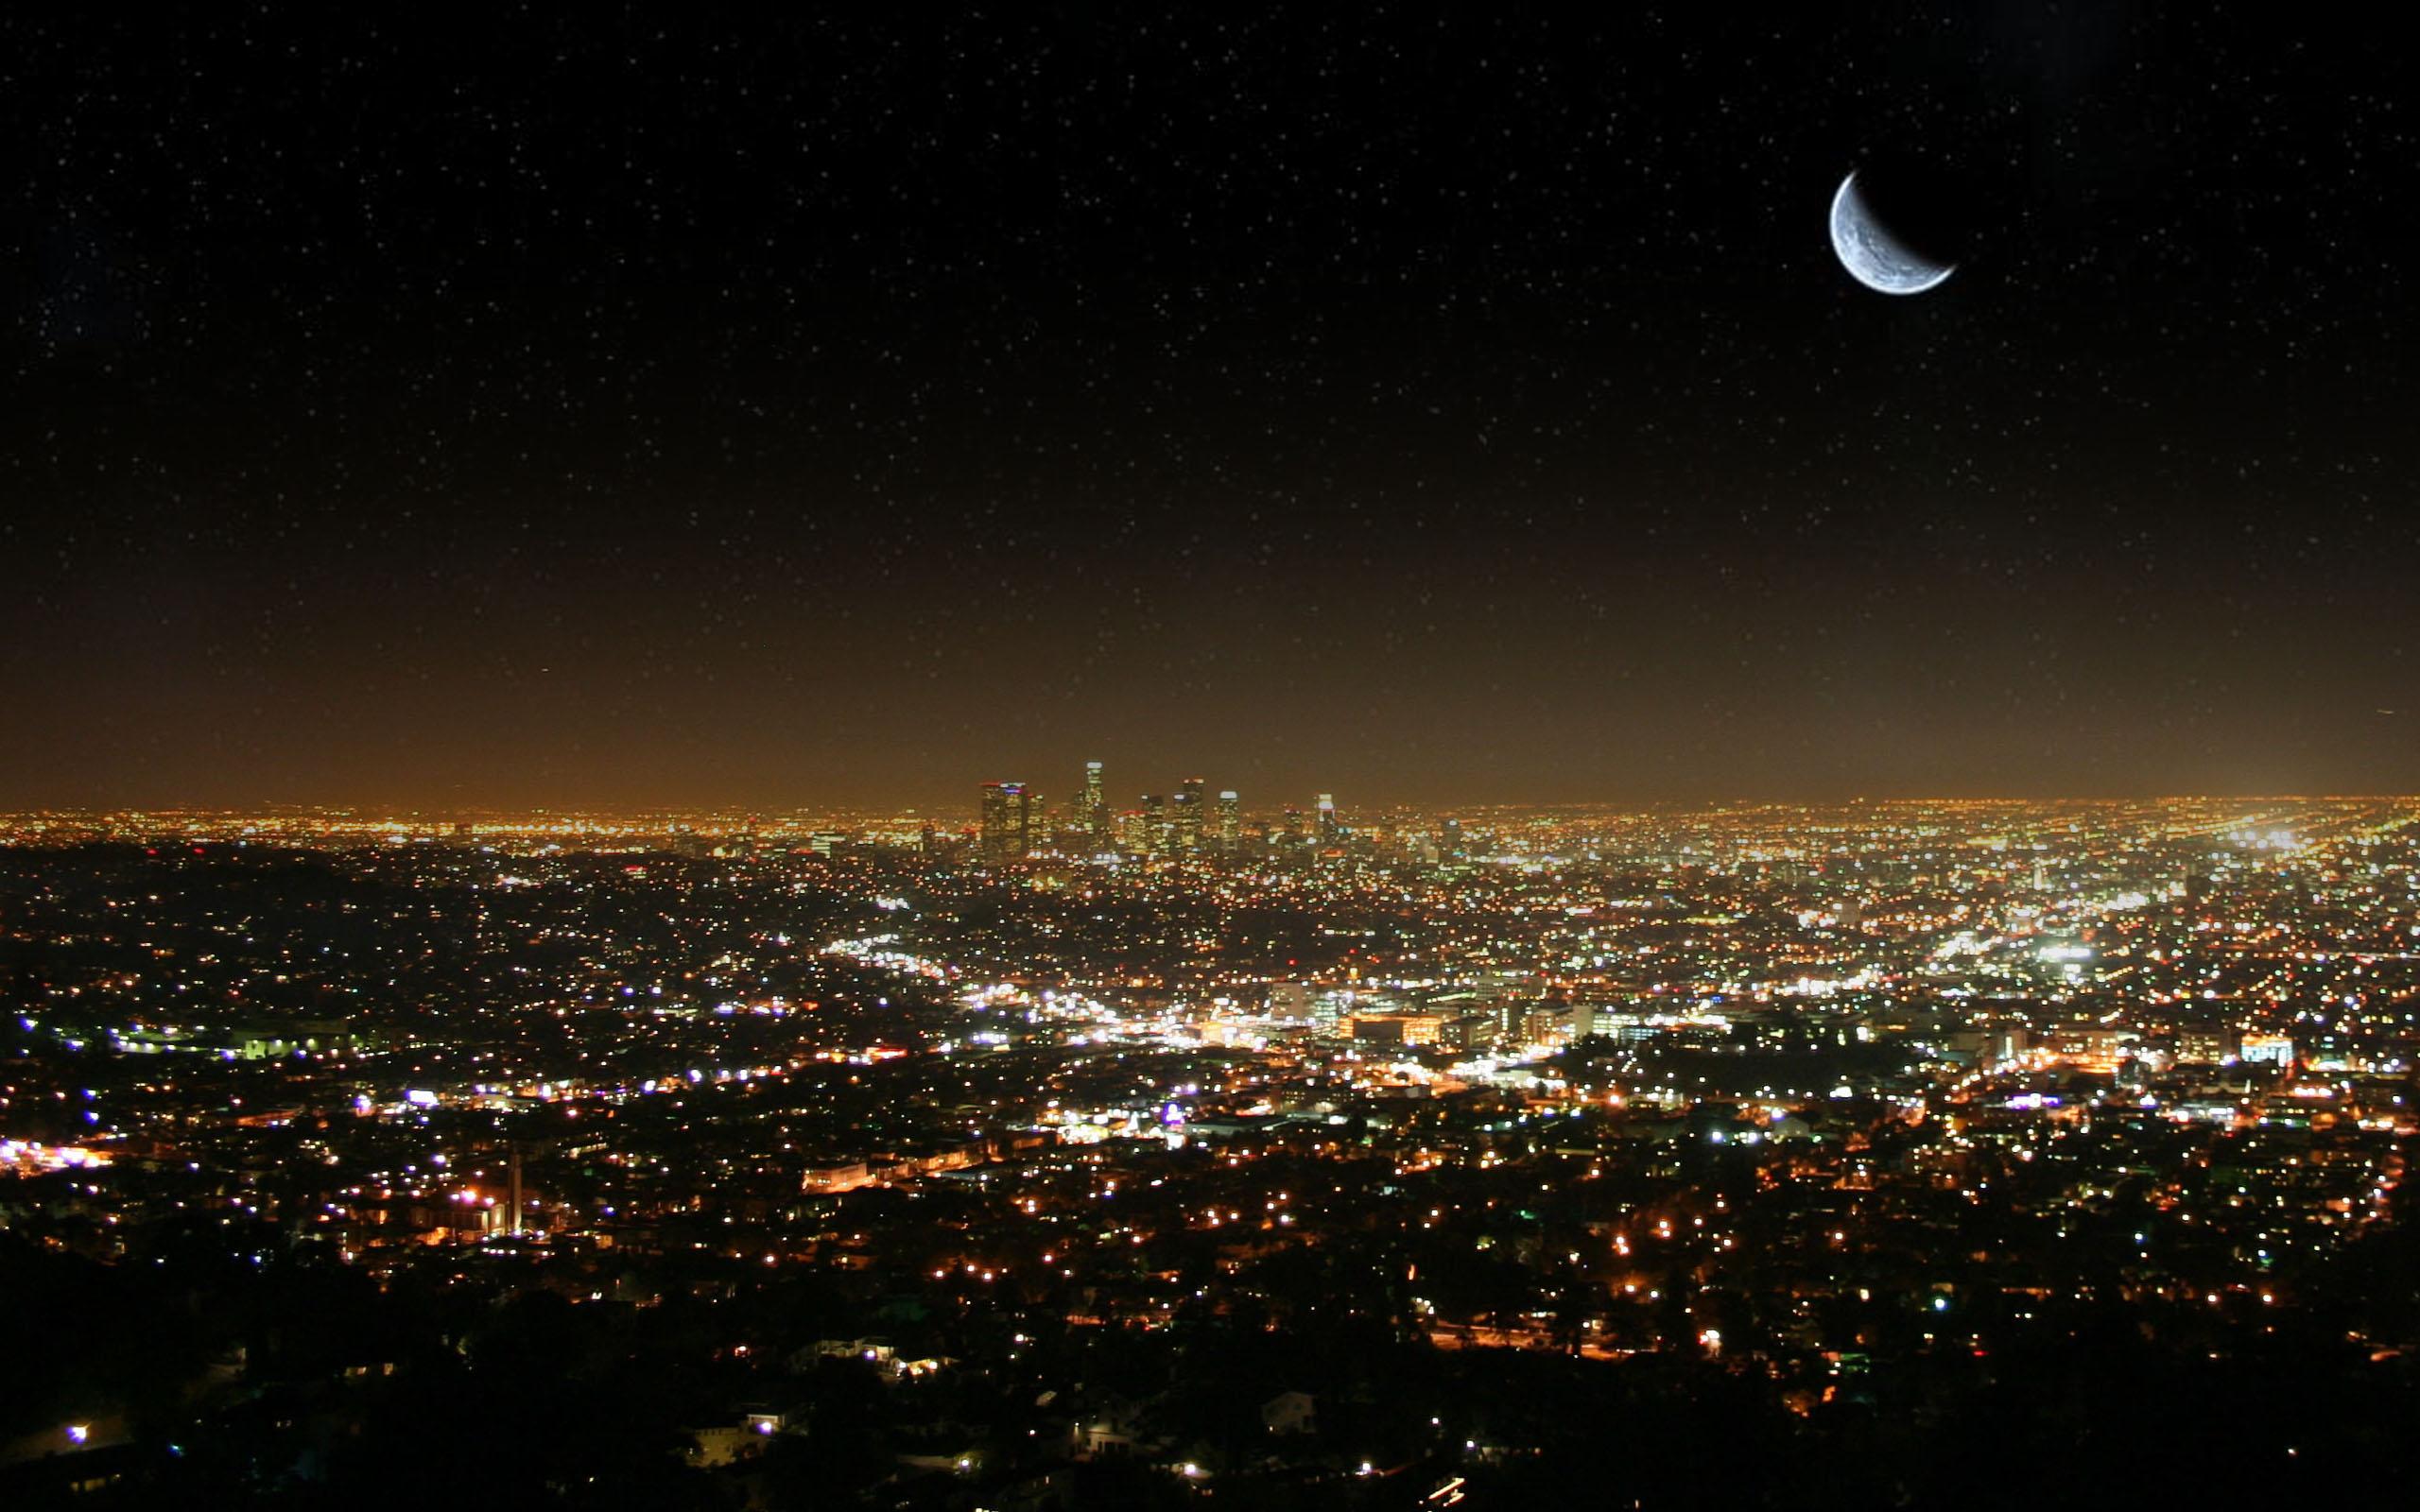 Hd wallpaper night - La Los Angeles Desktop Wallpaper Wallpapers Hd Usa America